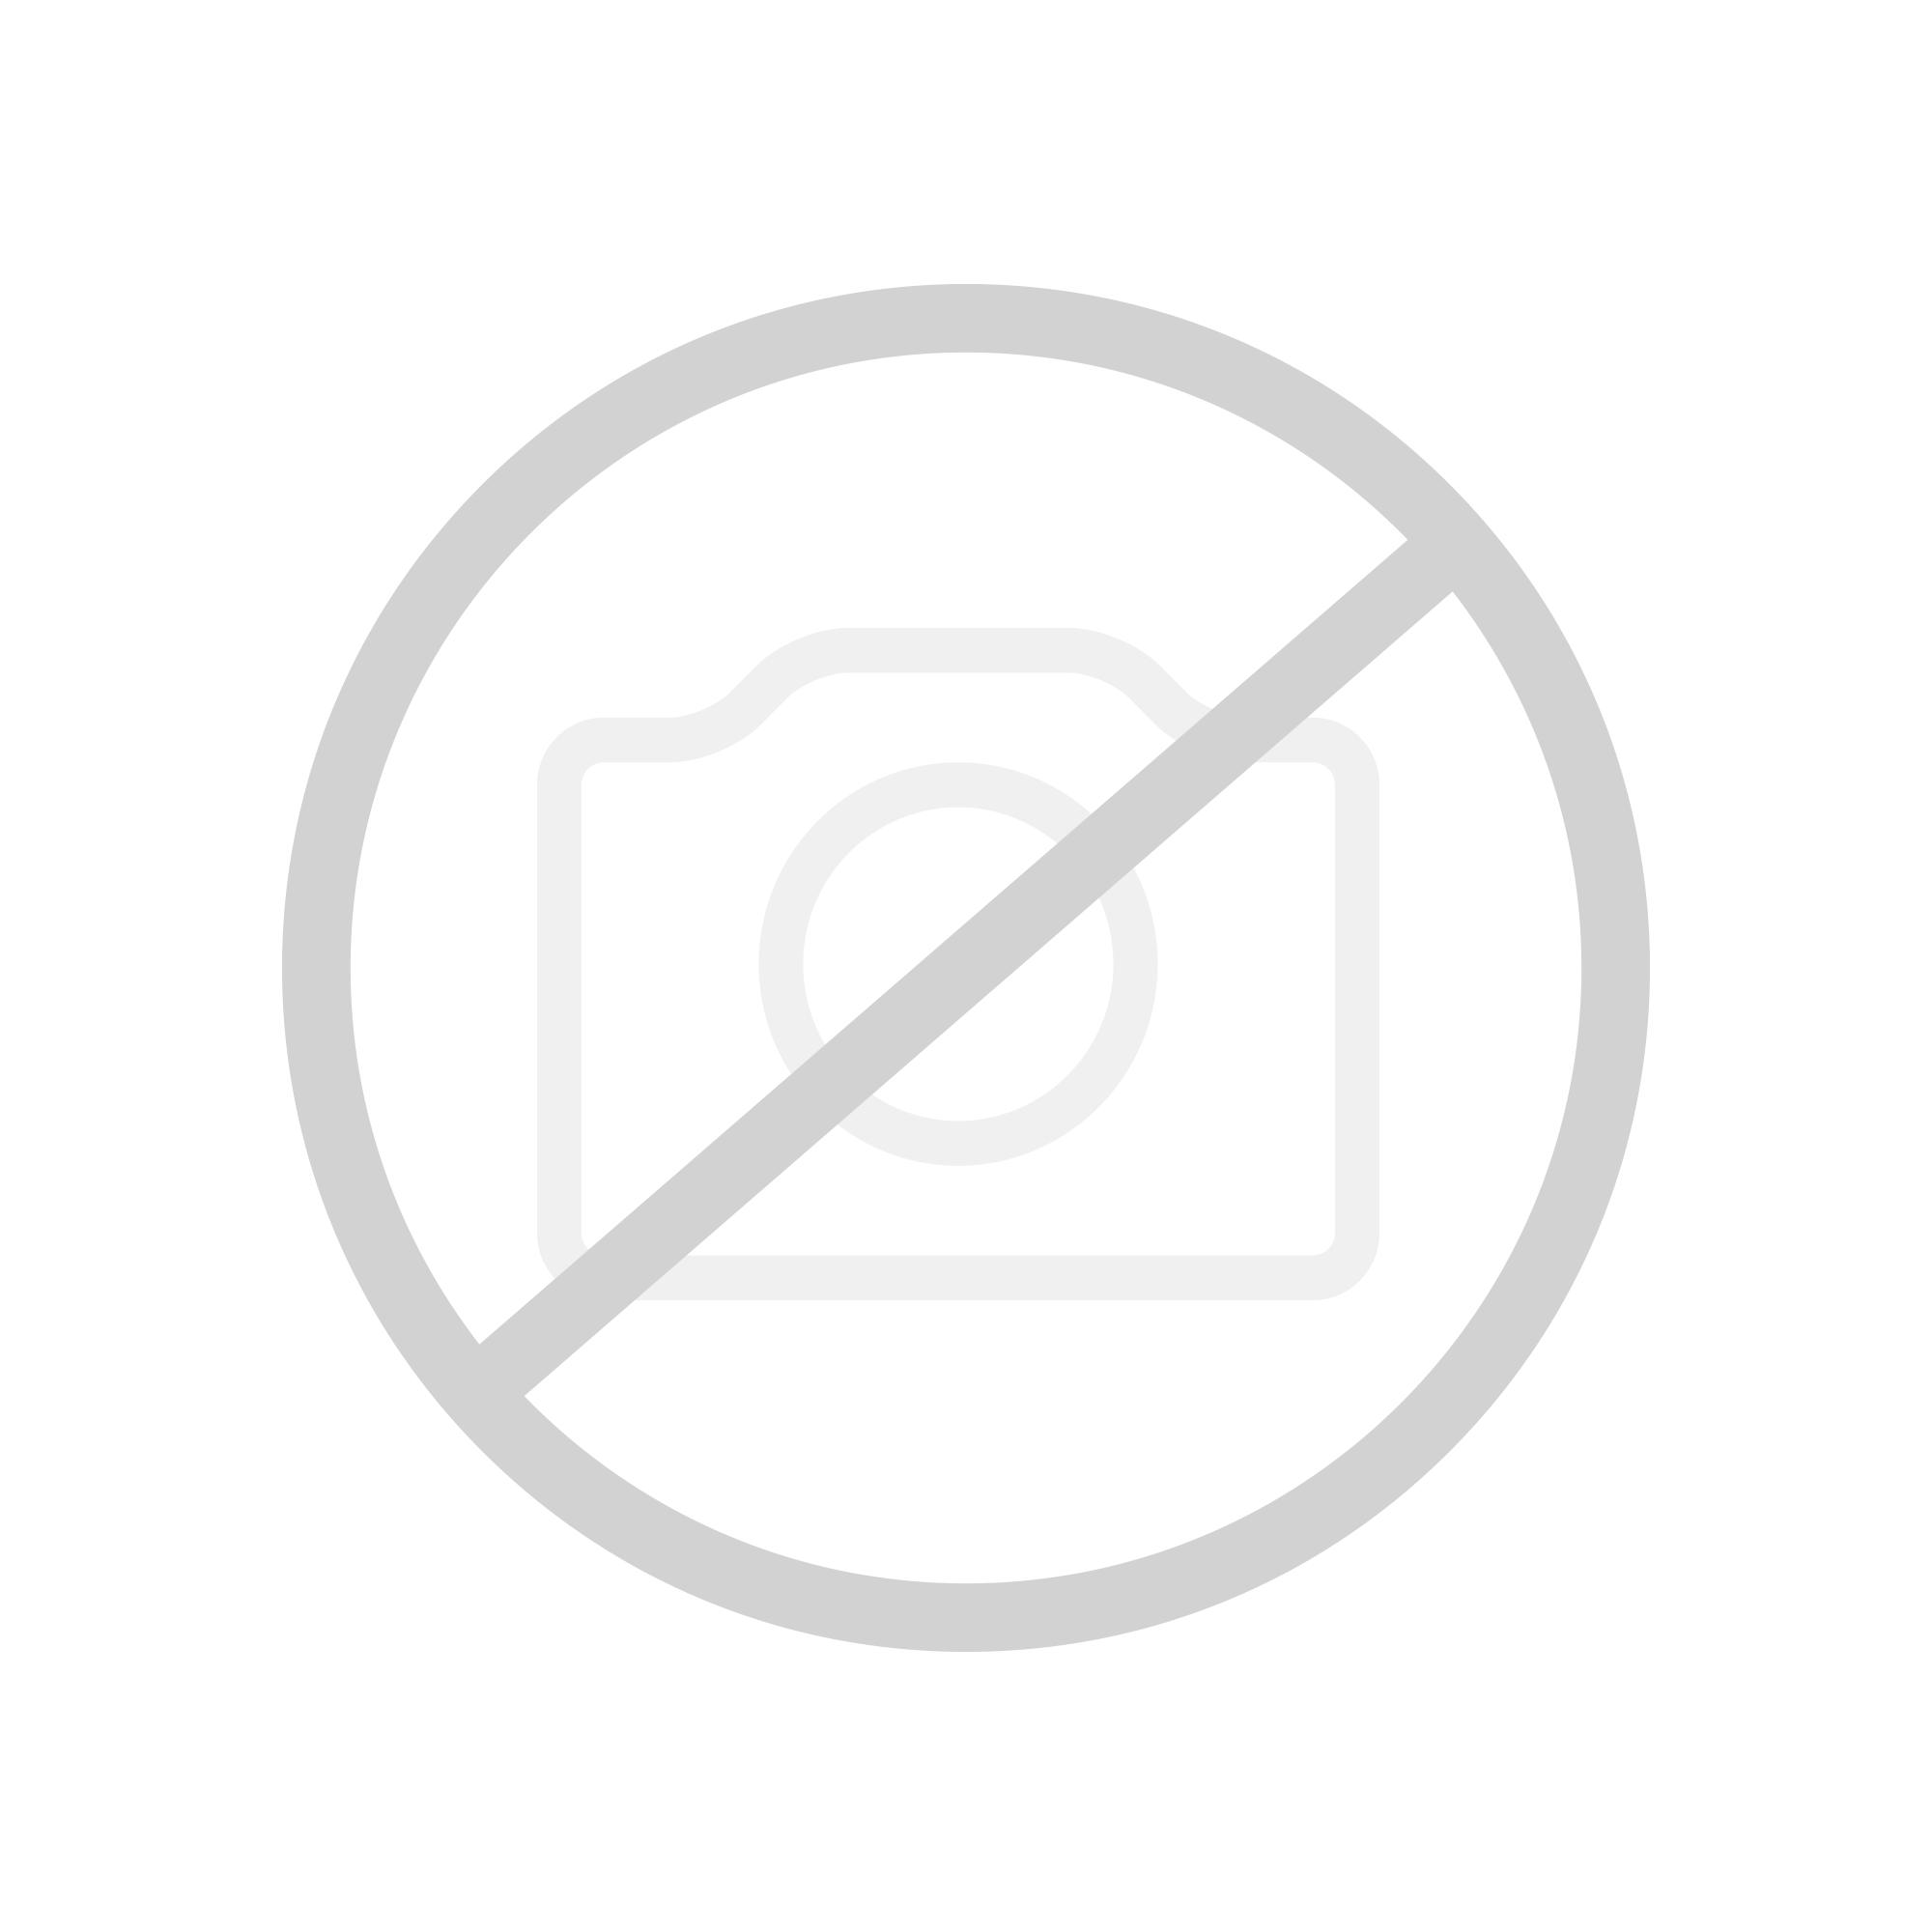 Hansgrohe Axor Bouroullec Showerpipe mit Thermostat und 1jet Kopfbrause